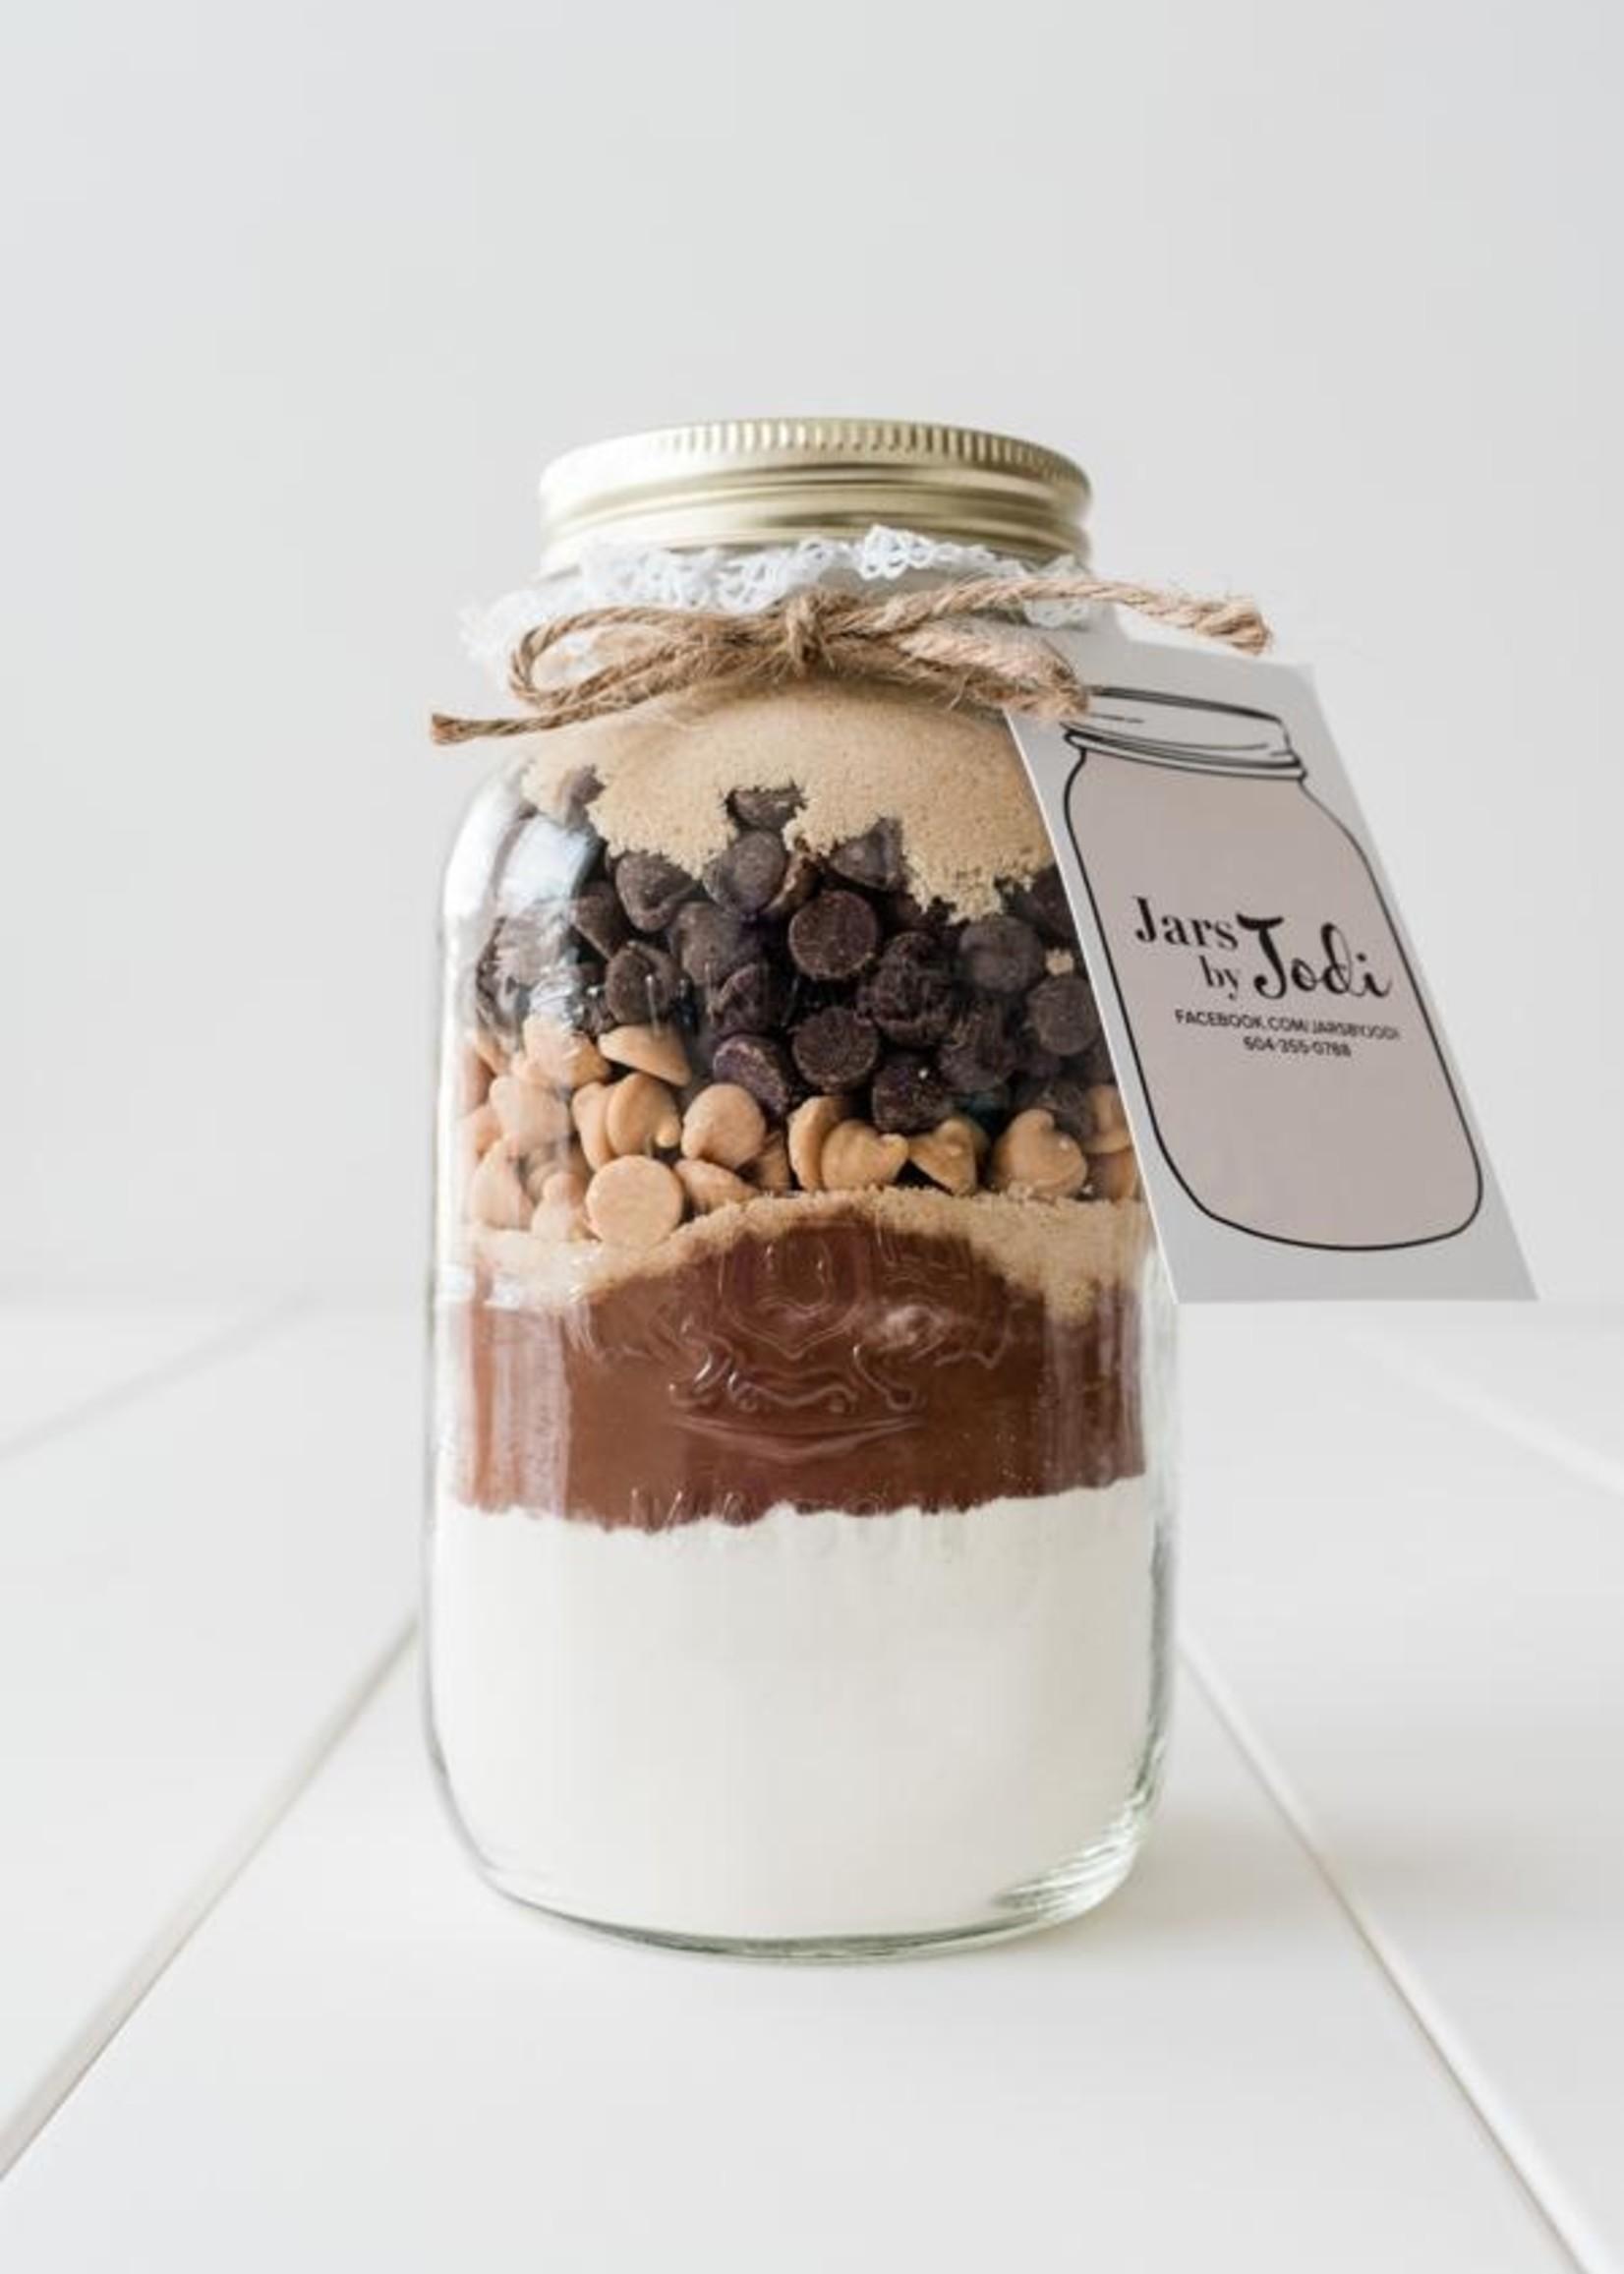 Jars By Jodi Double Chocolate Muffins